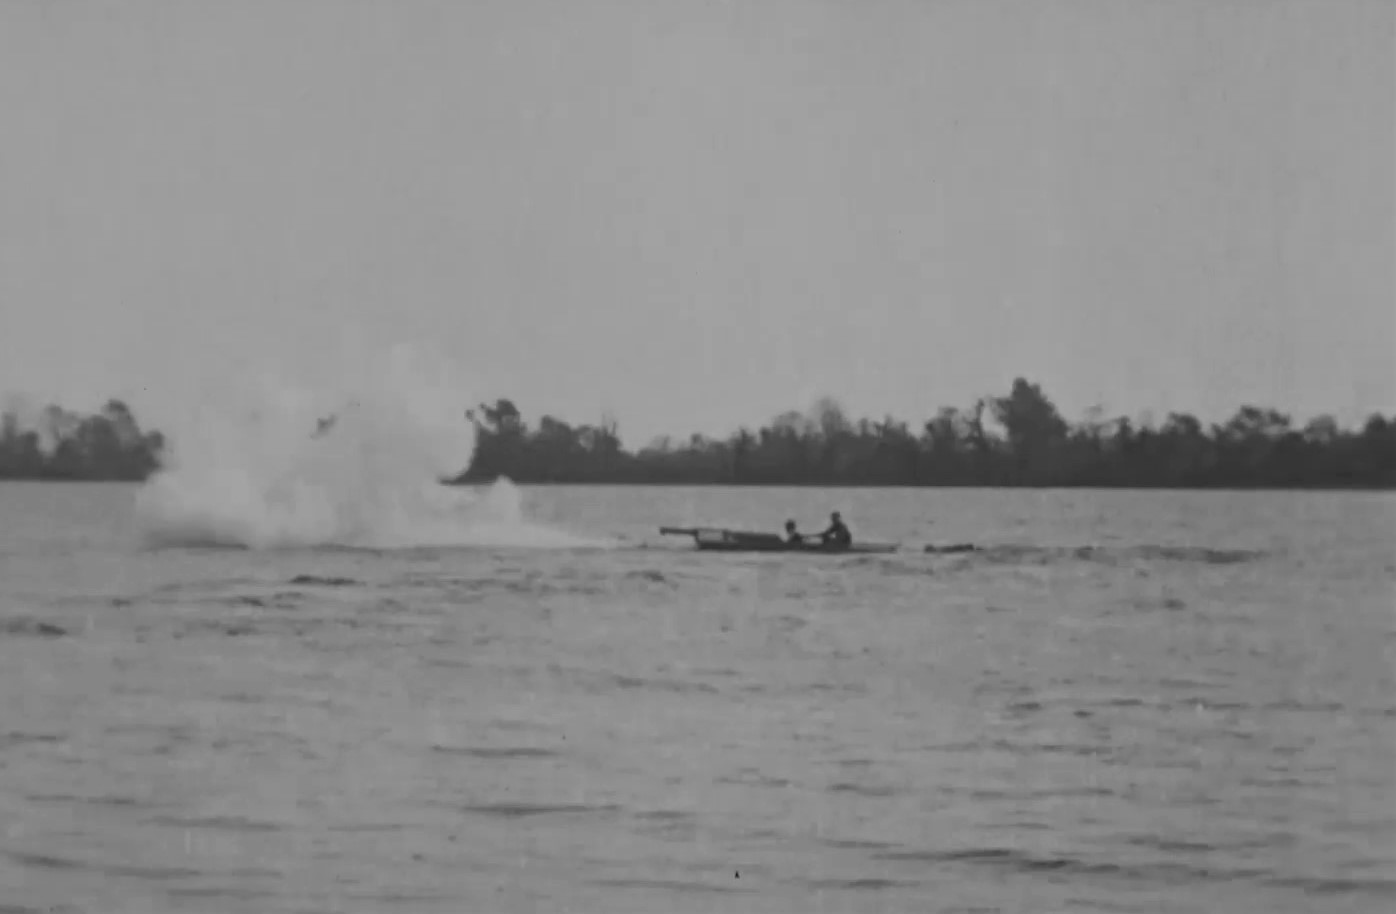 Christie Amphibous 75mm gun carrier 111-h-1246-r1_HD_2Mbps_Trim_Momenta